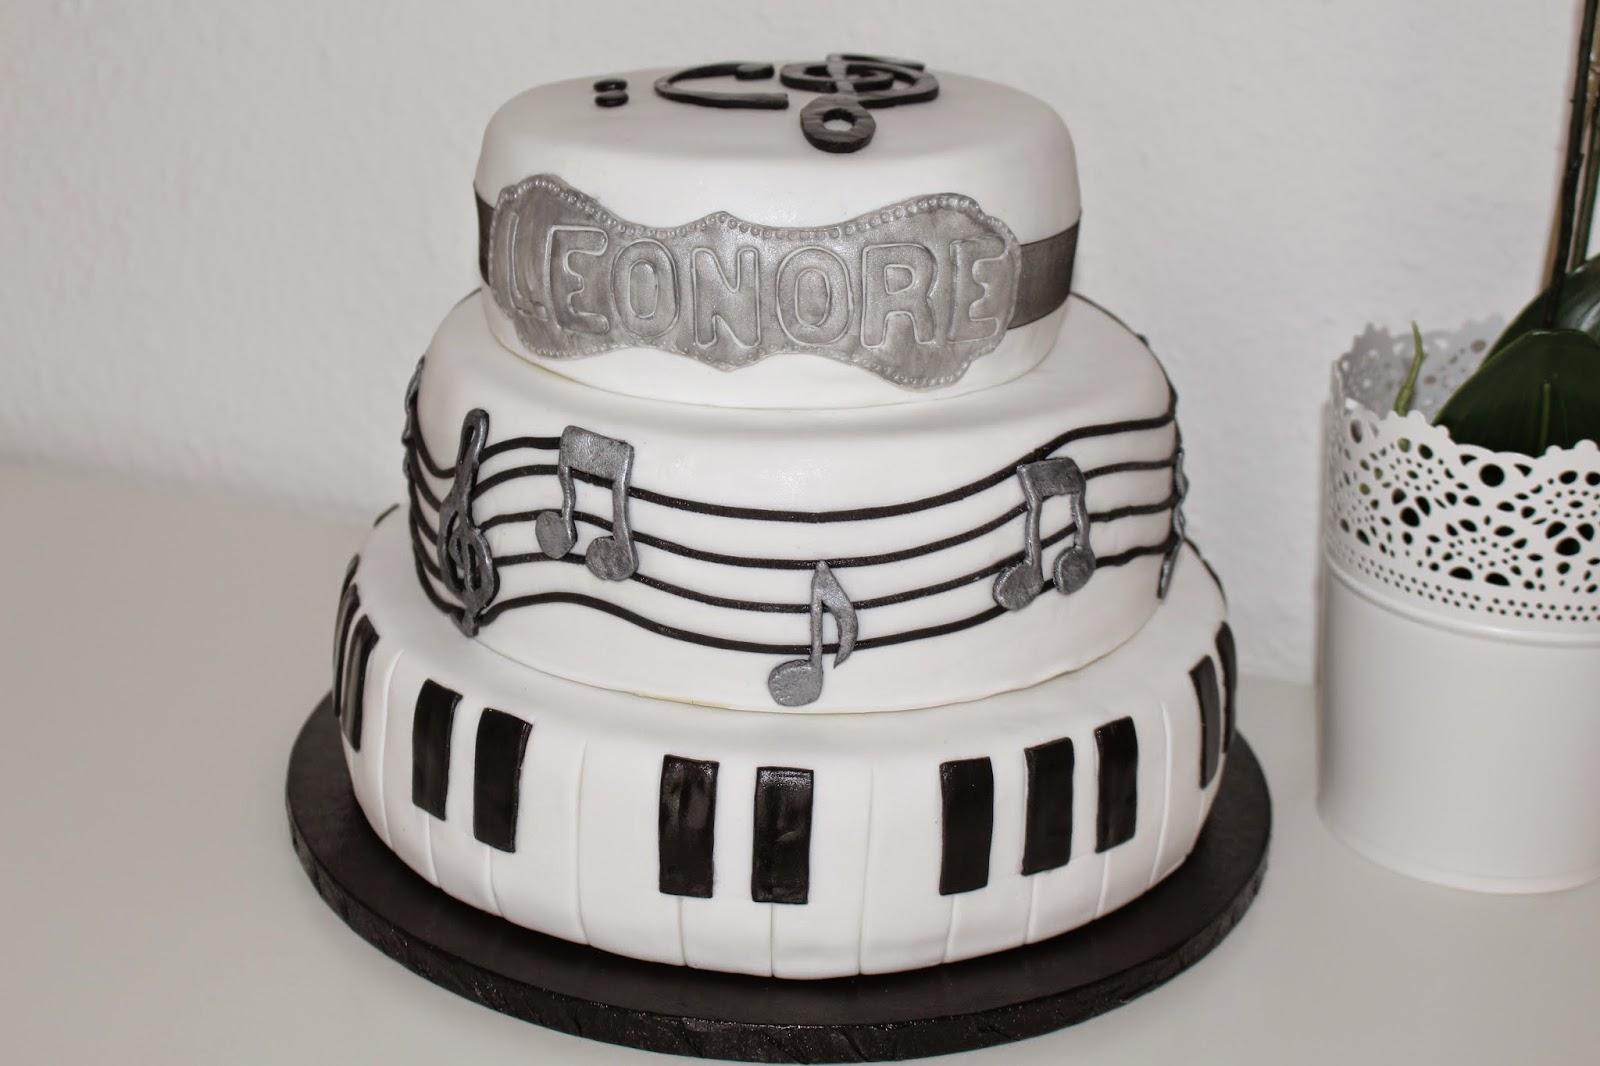 I Bake You Smile Torte Zum 60 Geburtstag